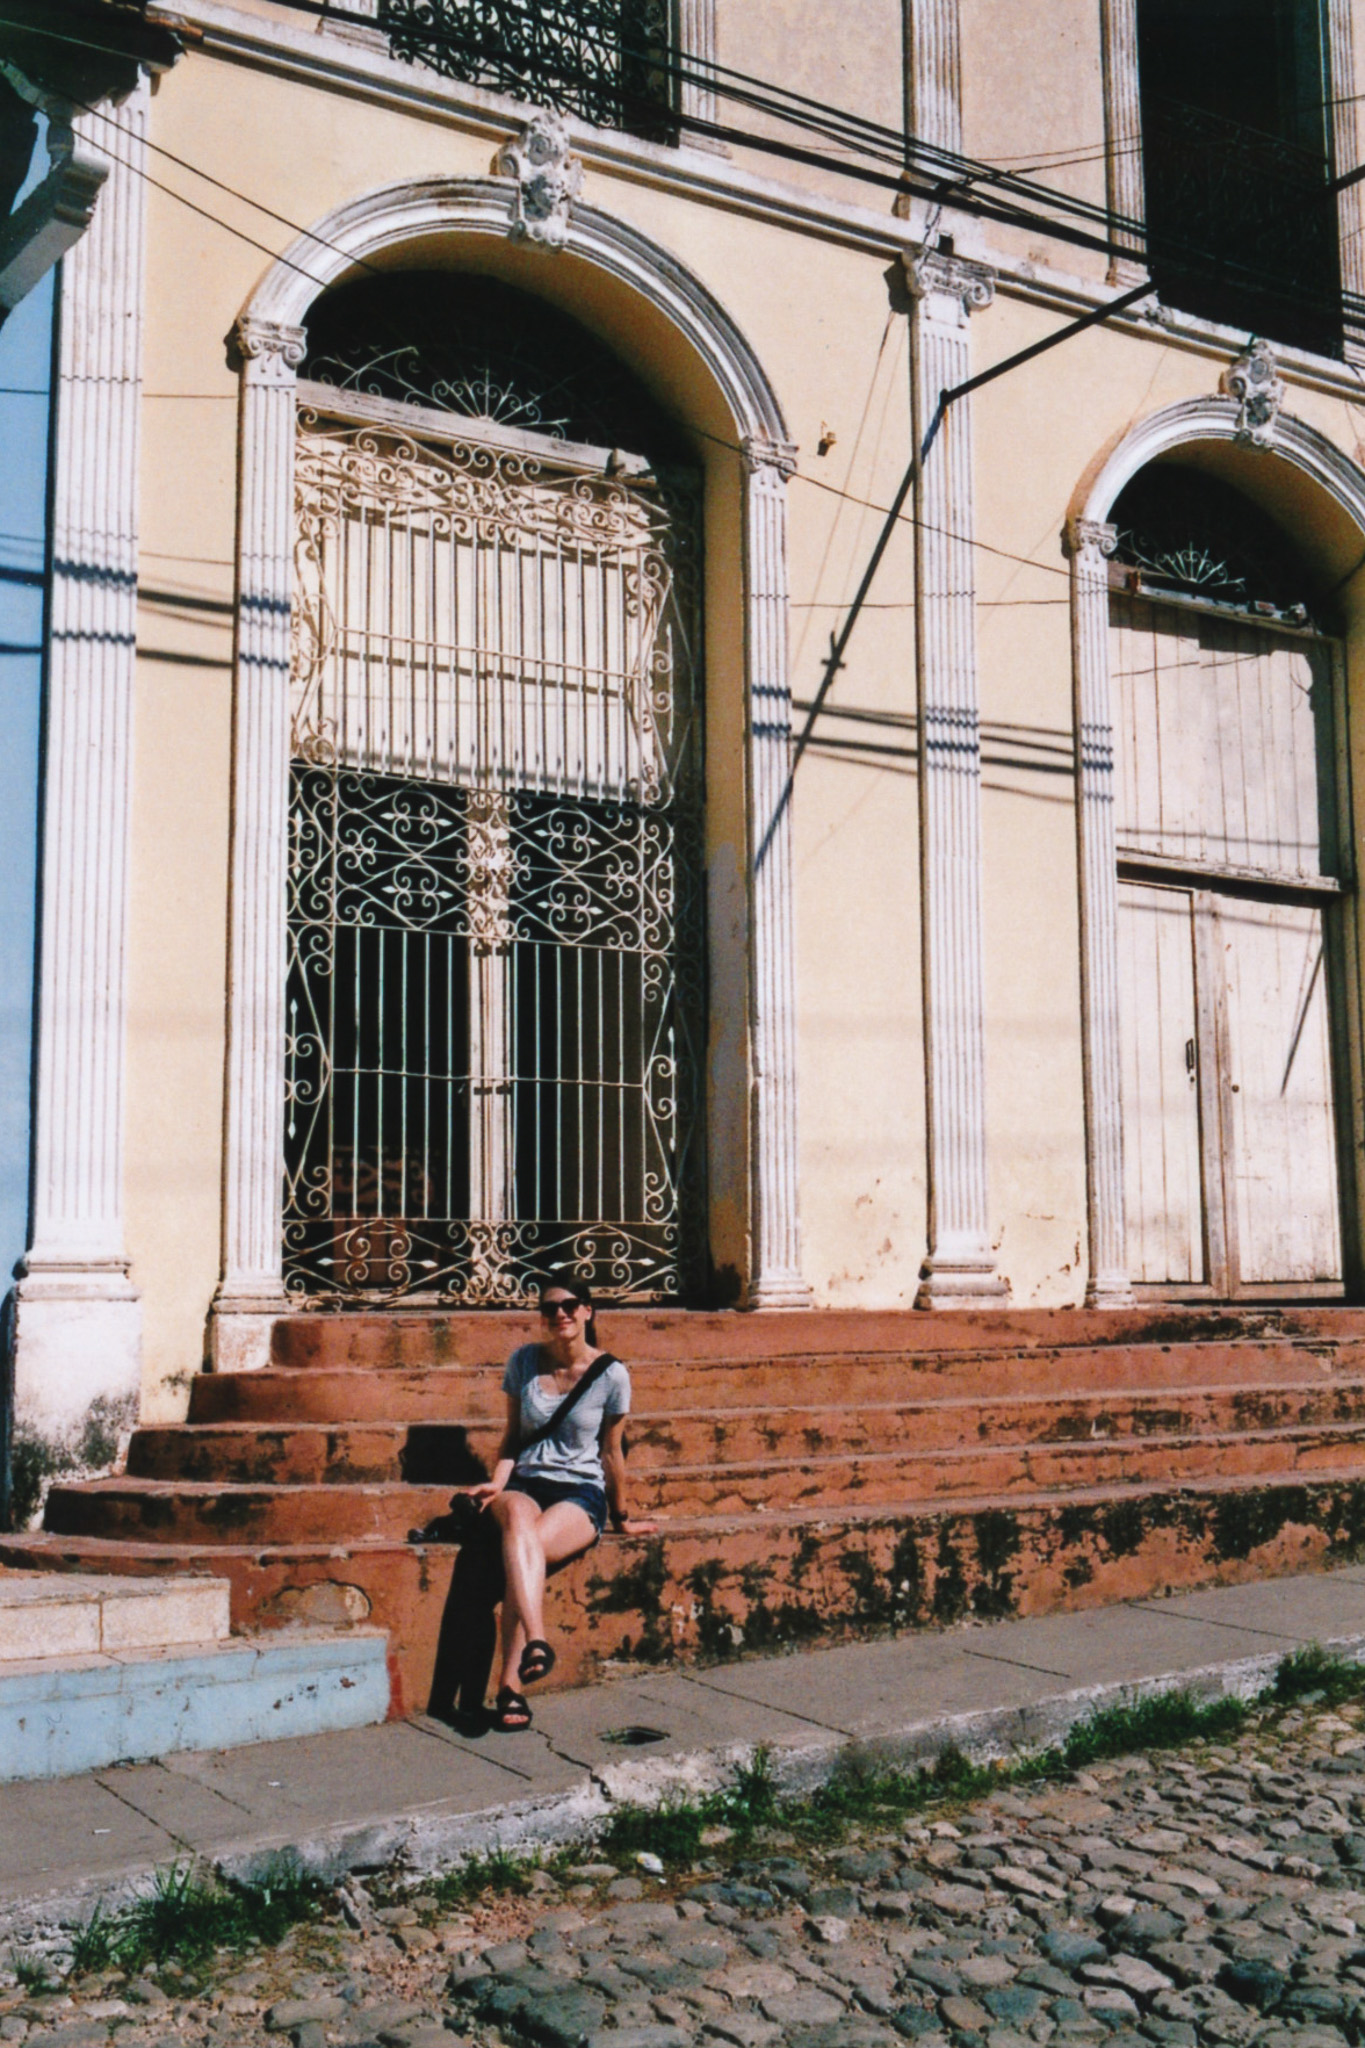 Kuba-2017-12-Analog-109.jpg